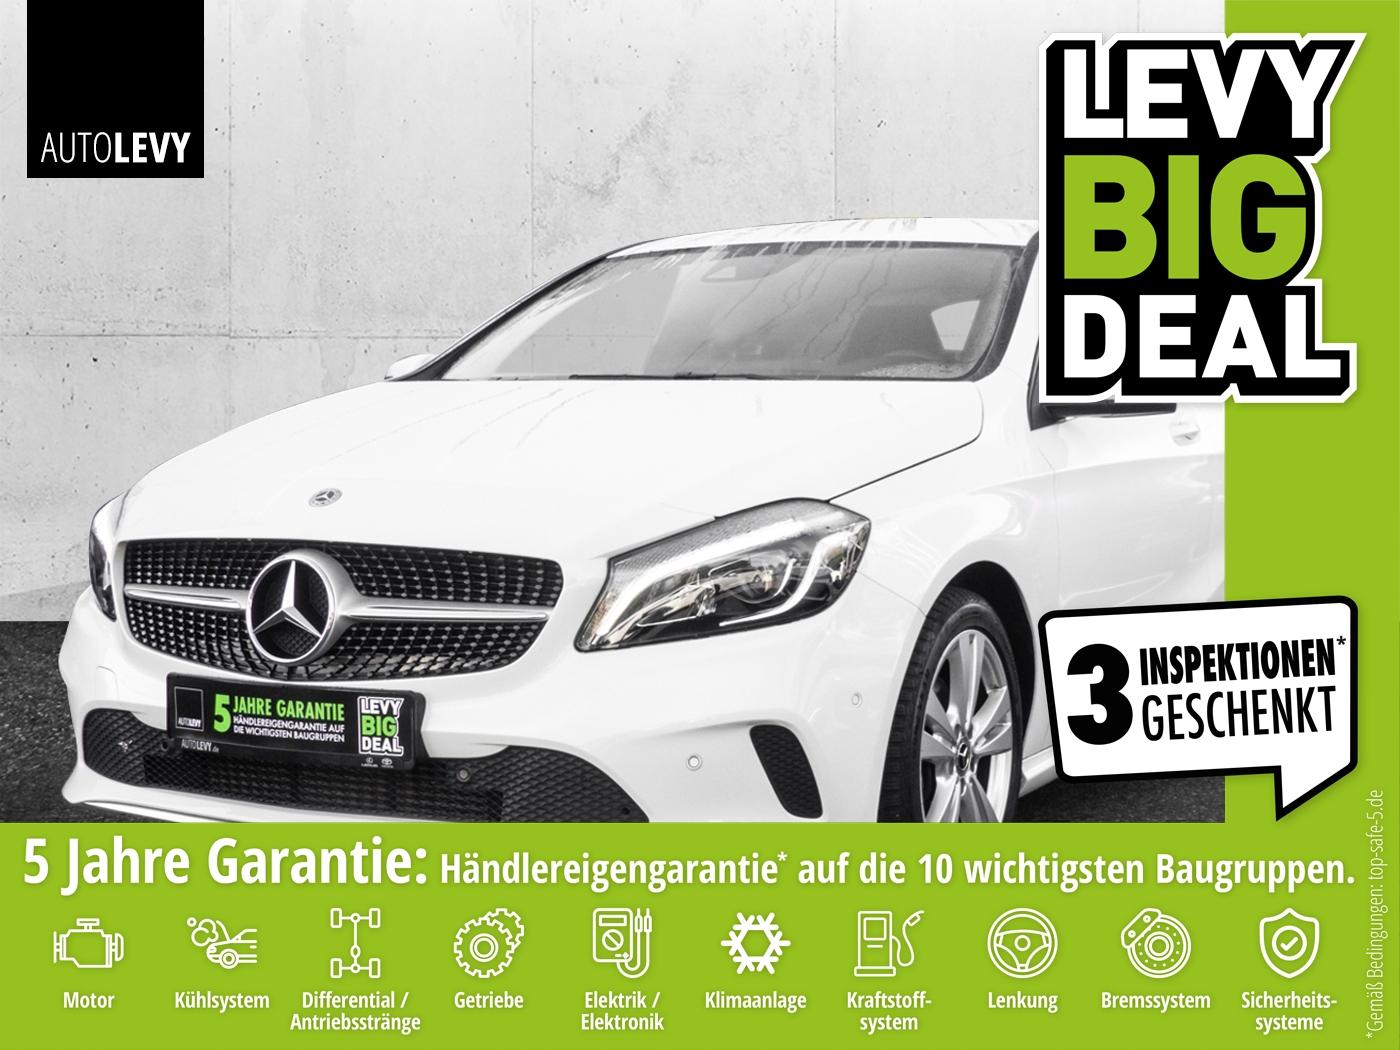 Mercedes-Benz A 180 Urban *NAVI*LED*ALLWETTER*PARKTRONIC*, Jahr 2017, Benzin